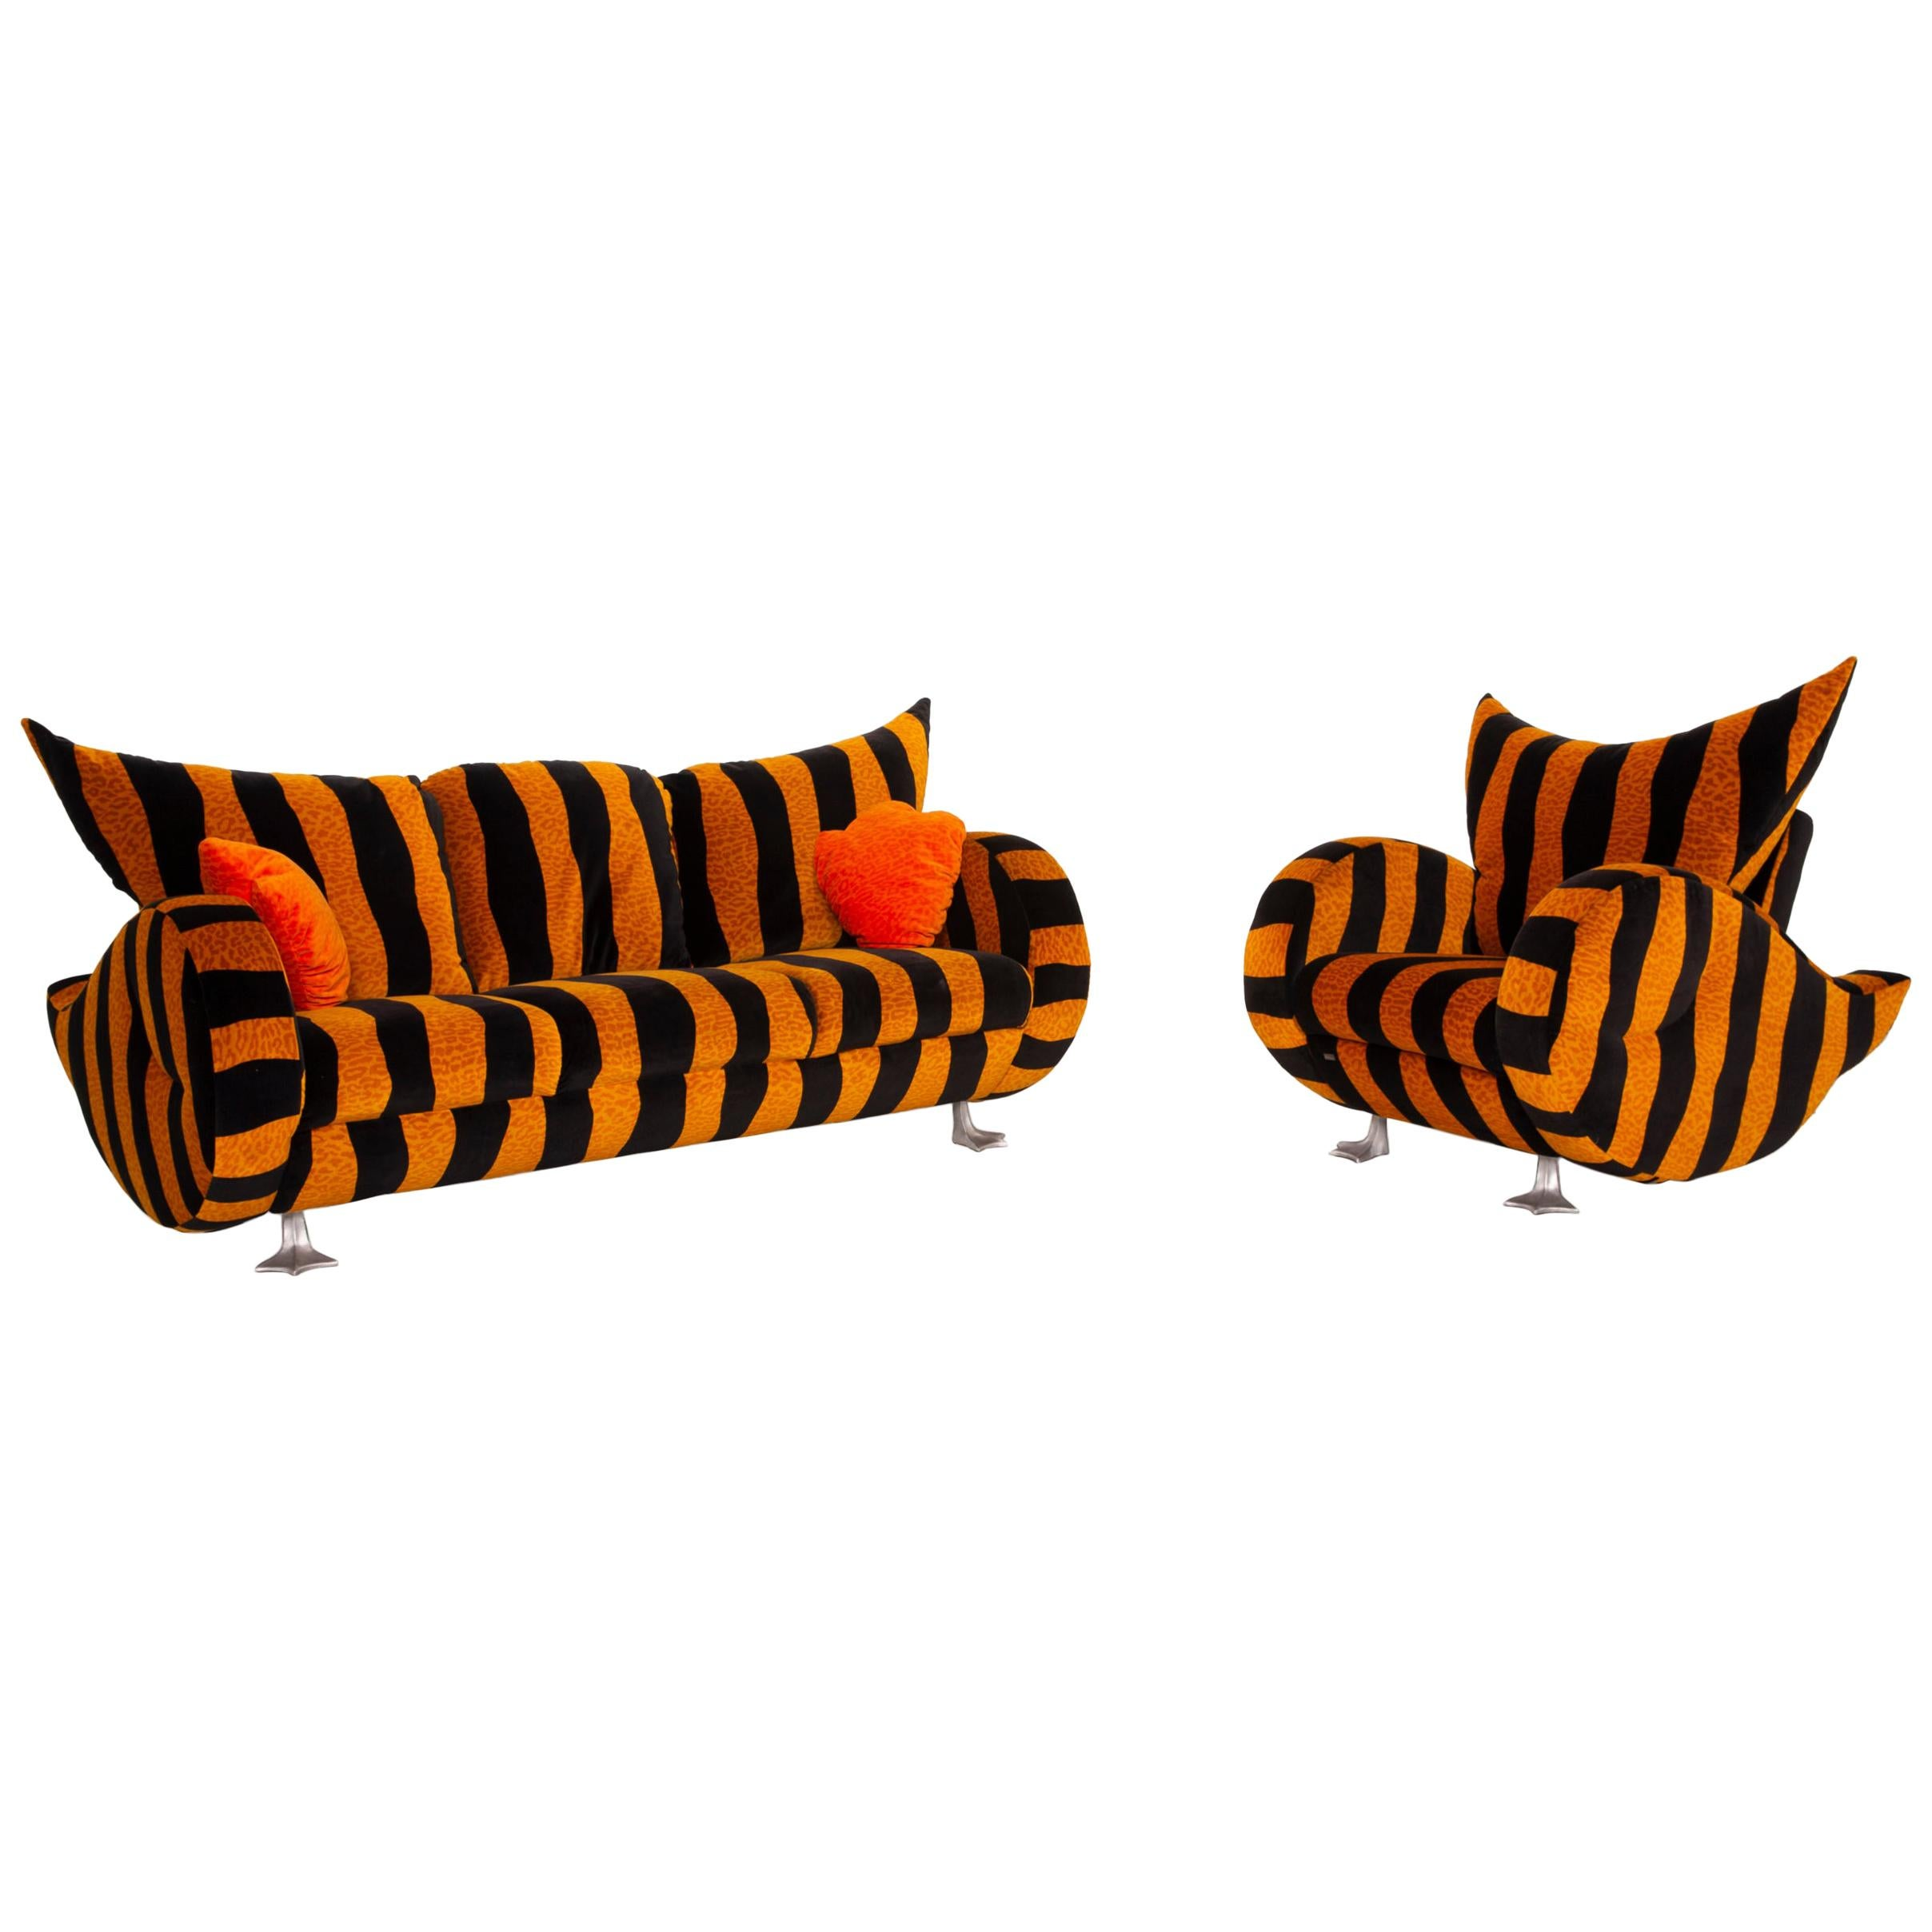 Bretz Prison Duck Fabric Sofa Set Yellow Three Seater Black Tiger Pattern